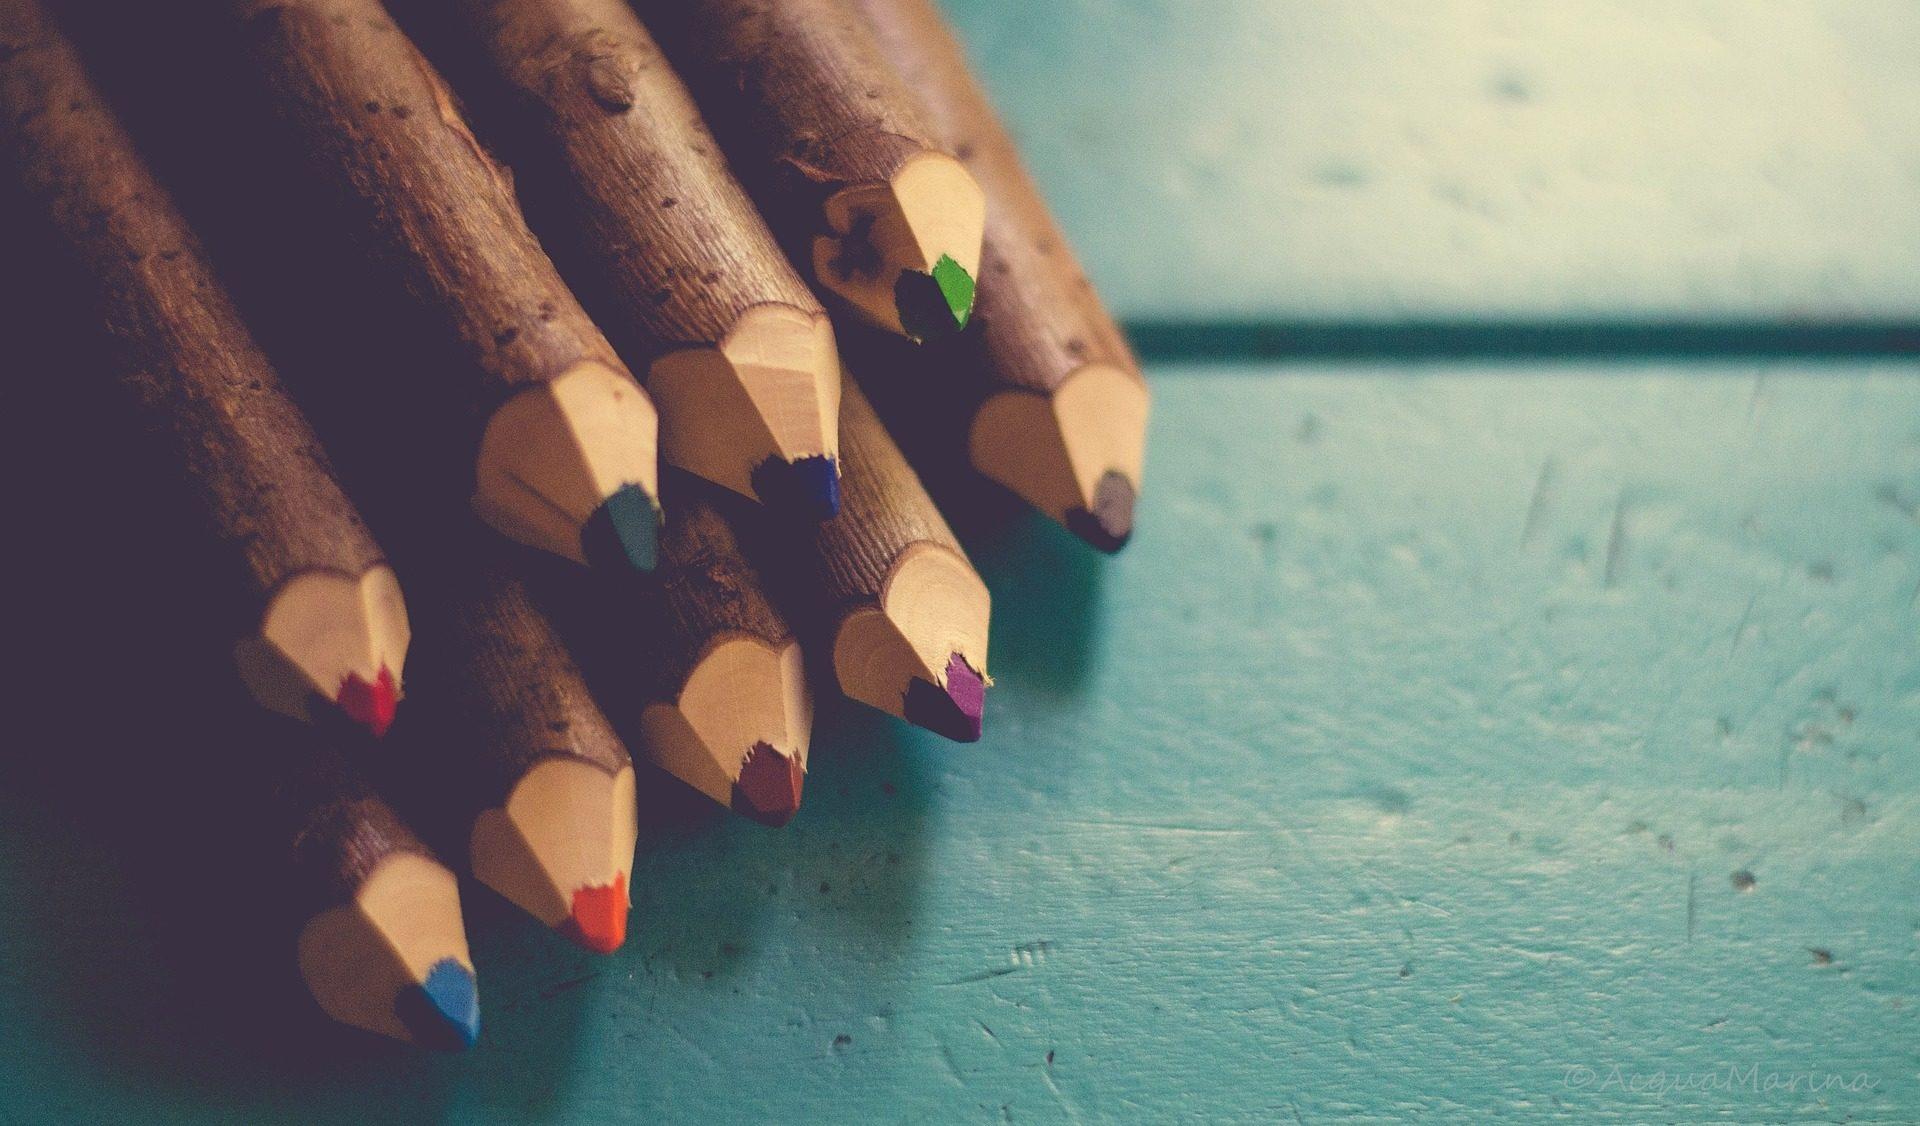 Schreibtipp: Wie werden Nebencharaktere lebendig?